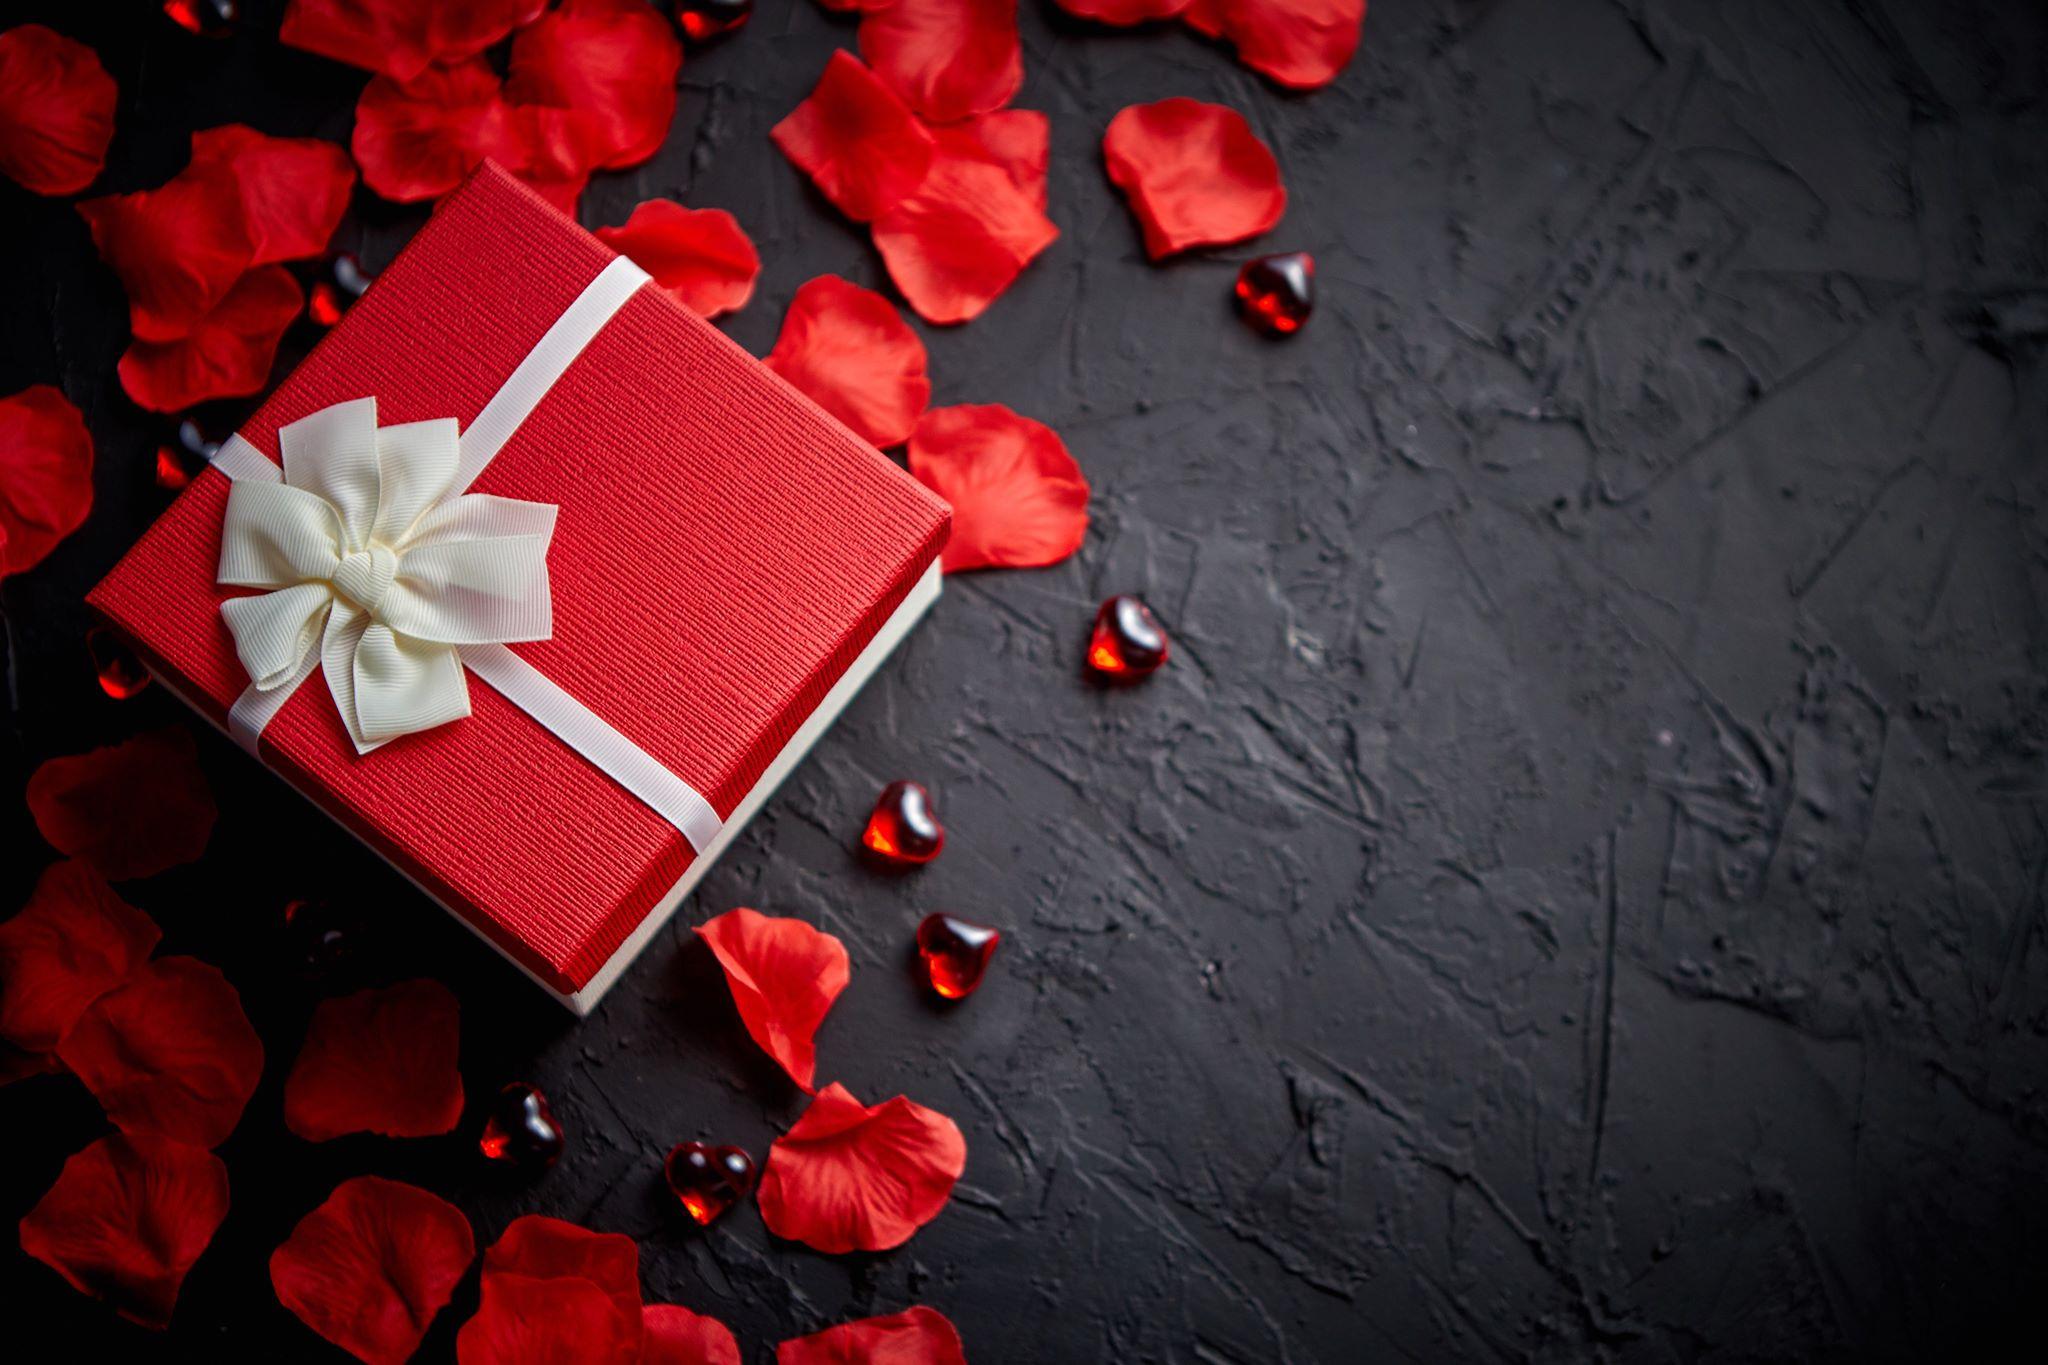 Valentines day images 20 صور عيد الحب